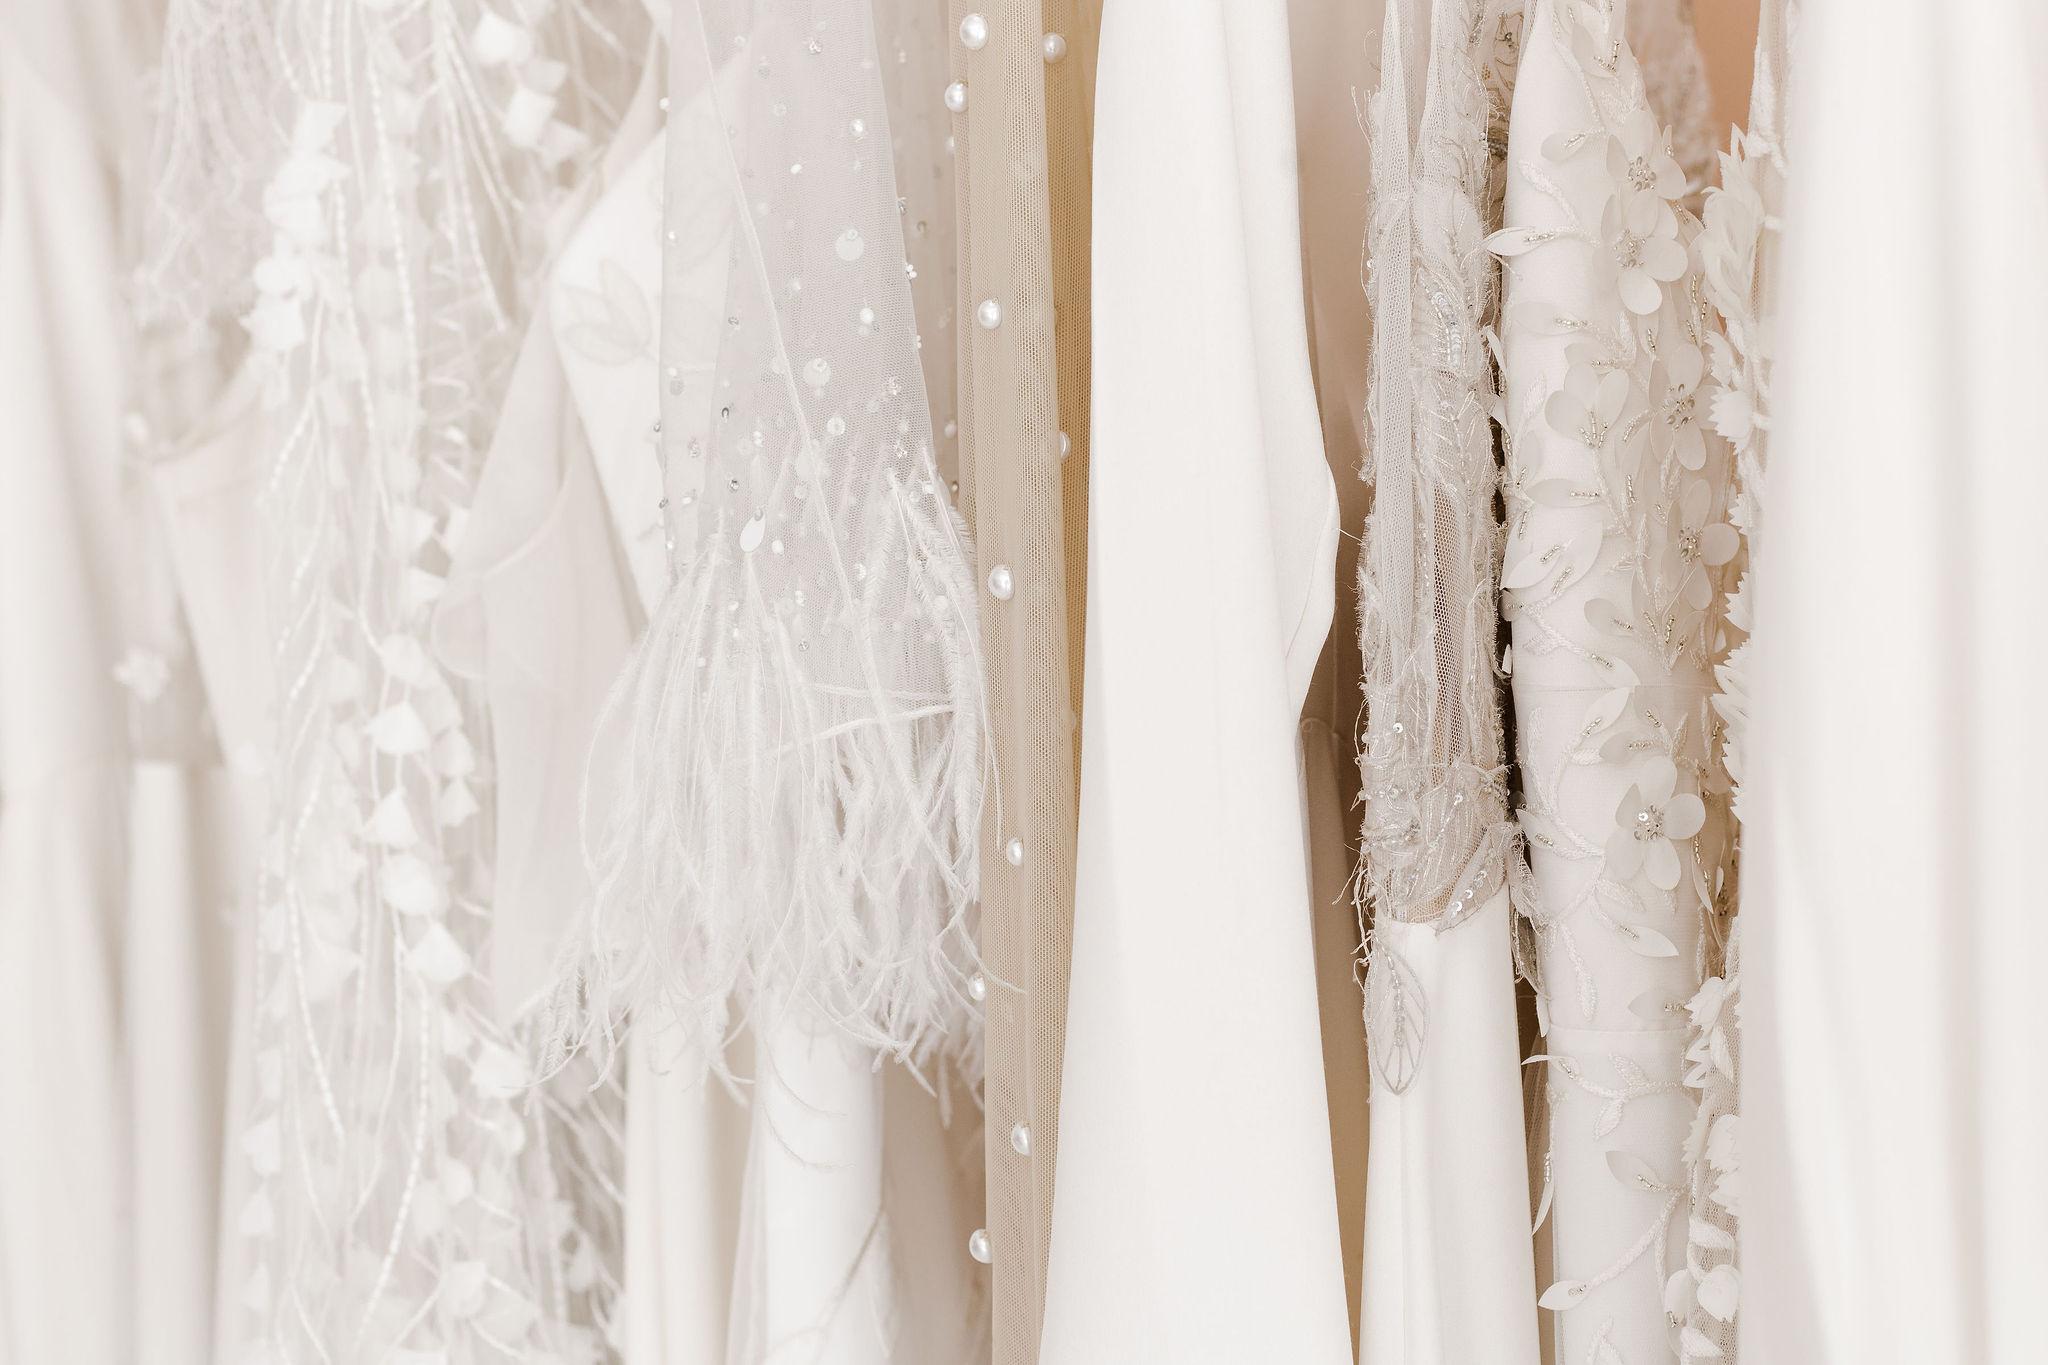 ghost orchid bride - - bridal boutique -